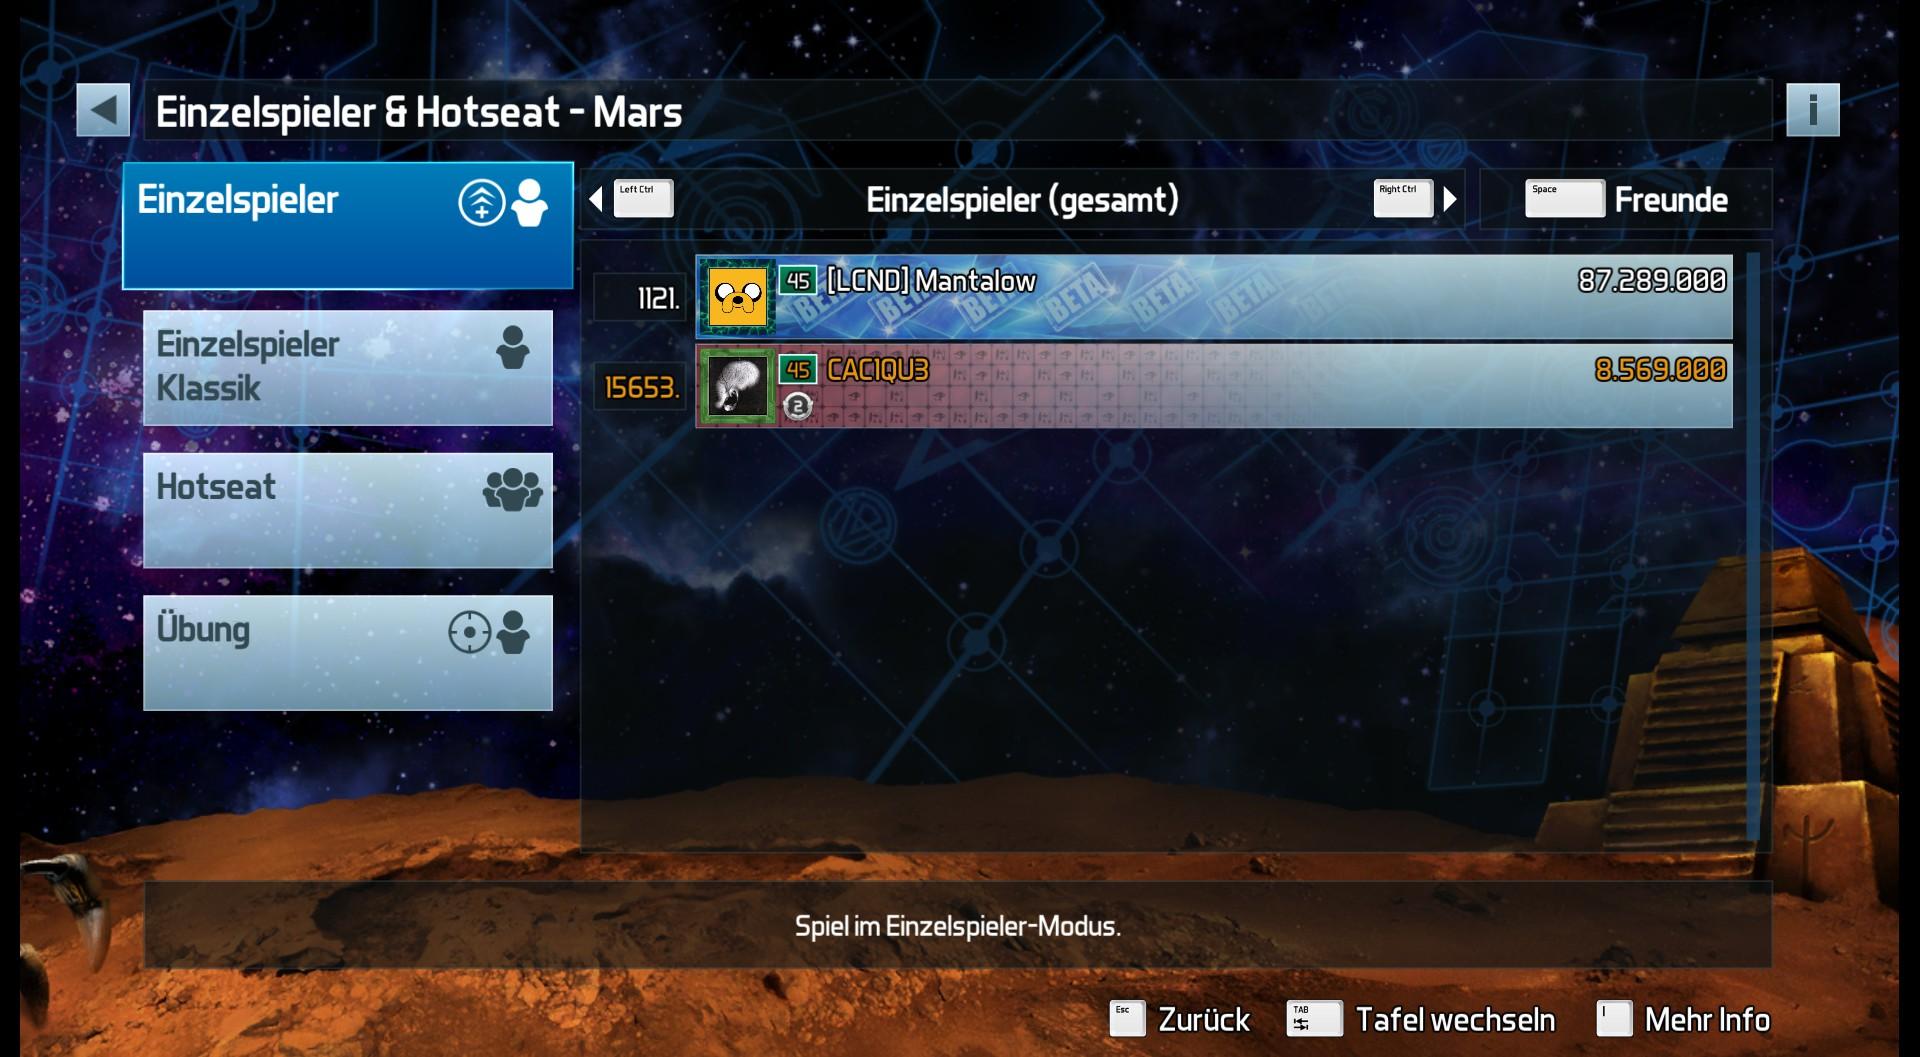 Pinball FX3: Mars 8,569,000 points